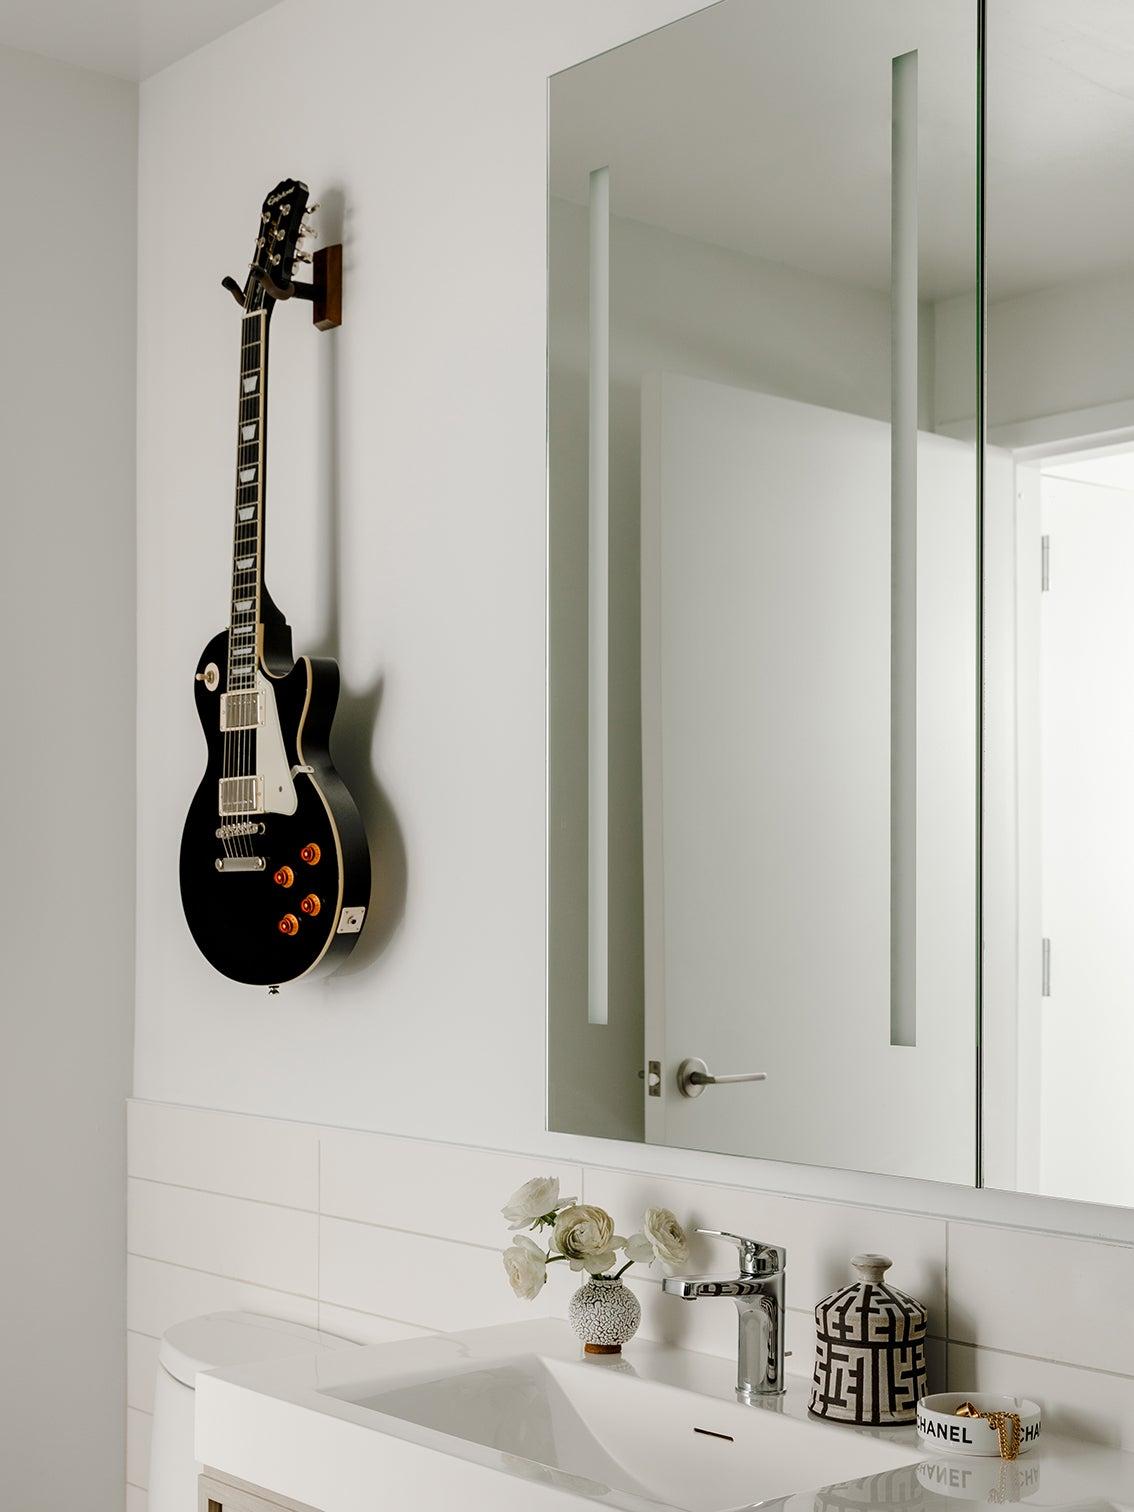 guitar hanging in bathroom